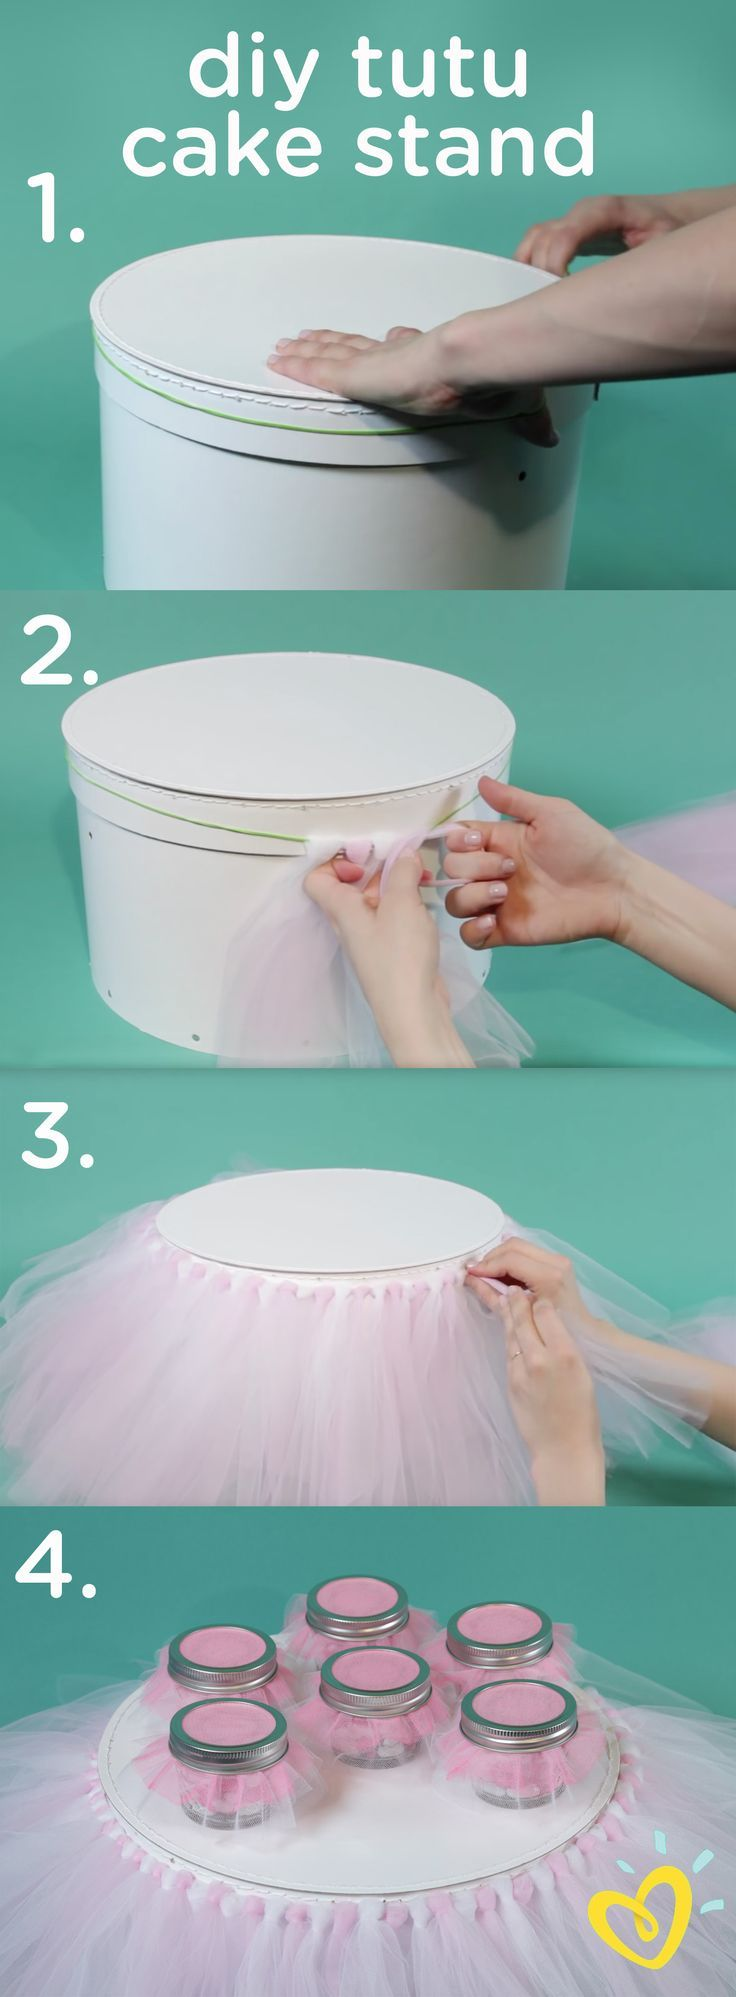 DIY tutu cake stand